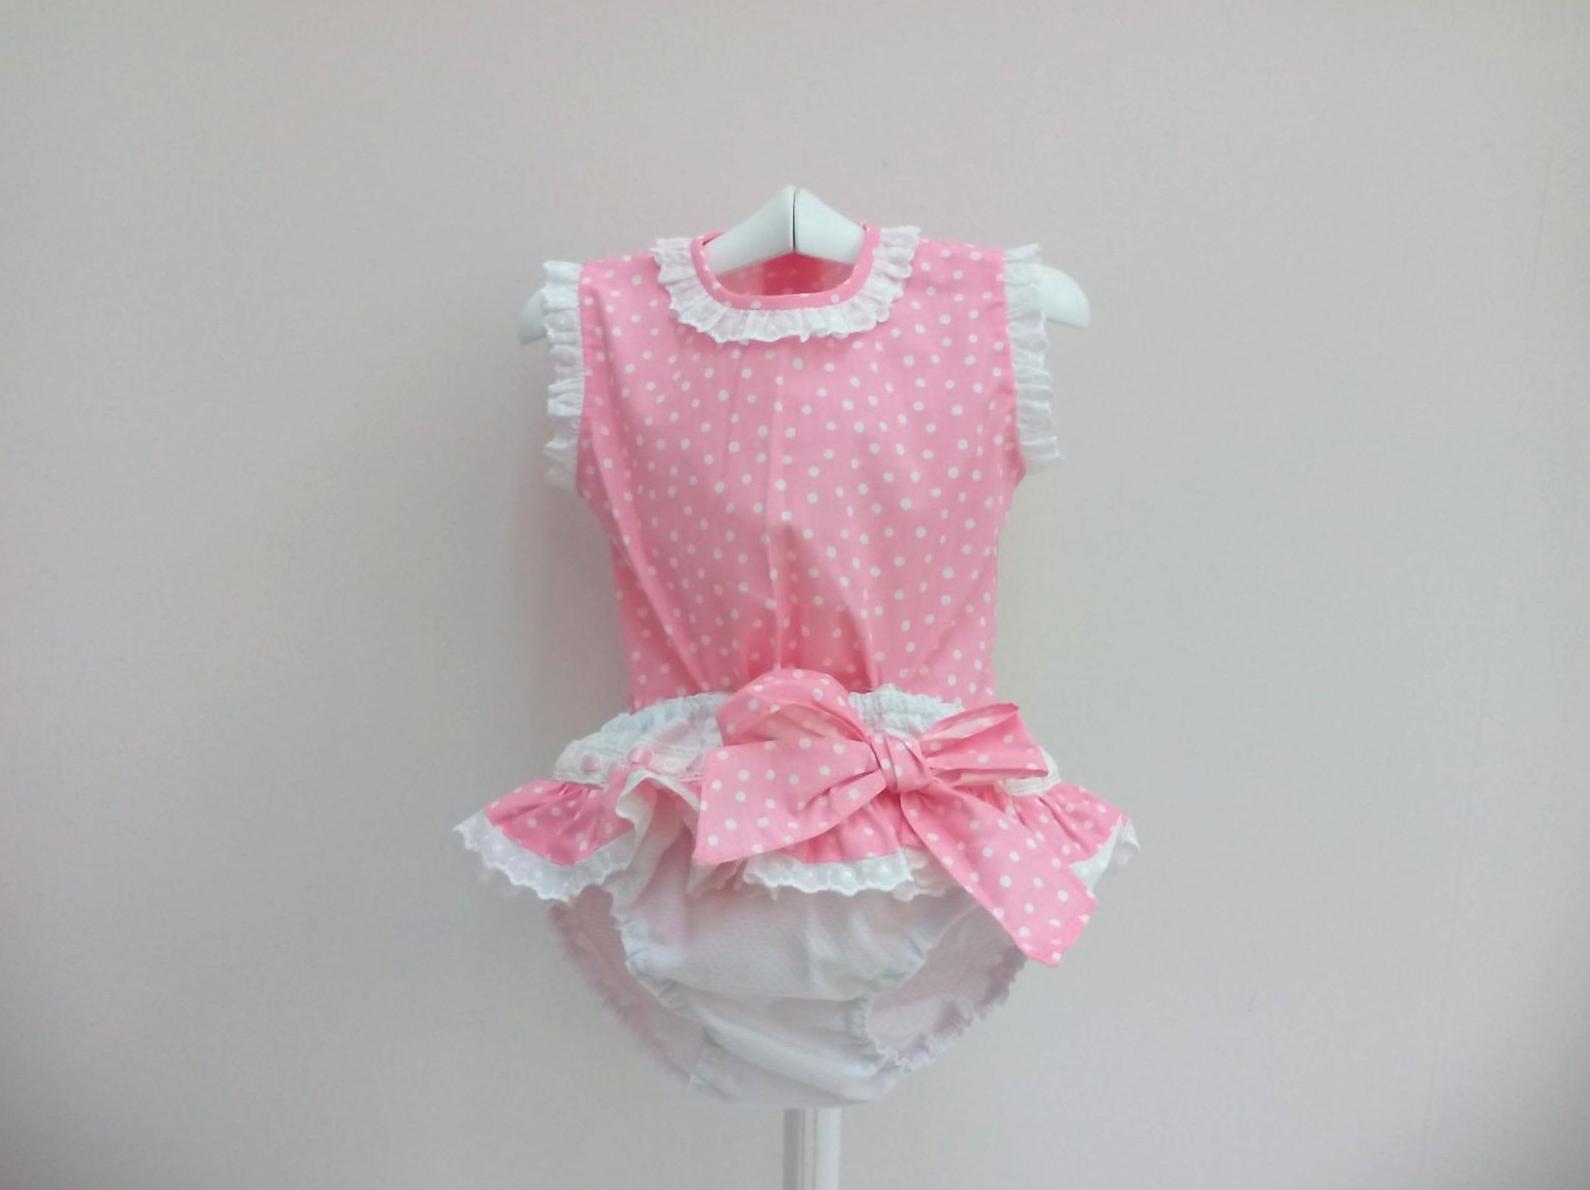 Camisa de niña con braga de piqué de Creaciones Alves